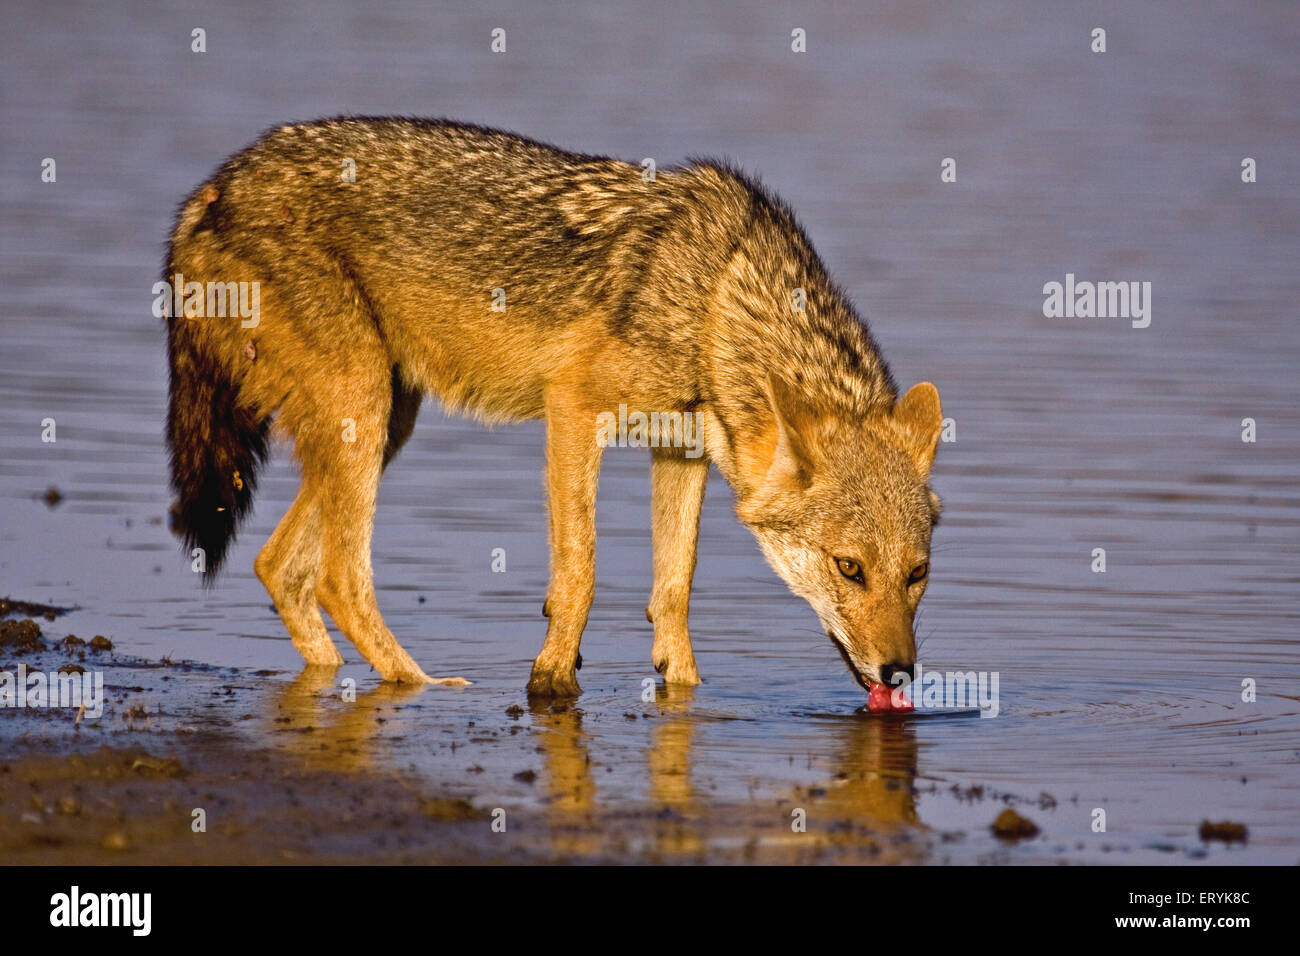 Golden chacal Canis aureus agua potable ; Parque nacional de Ranthambore ; ; Rajasthan India Foto de stock